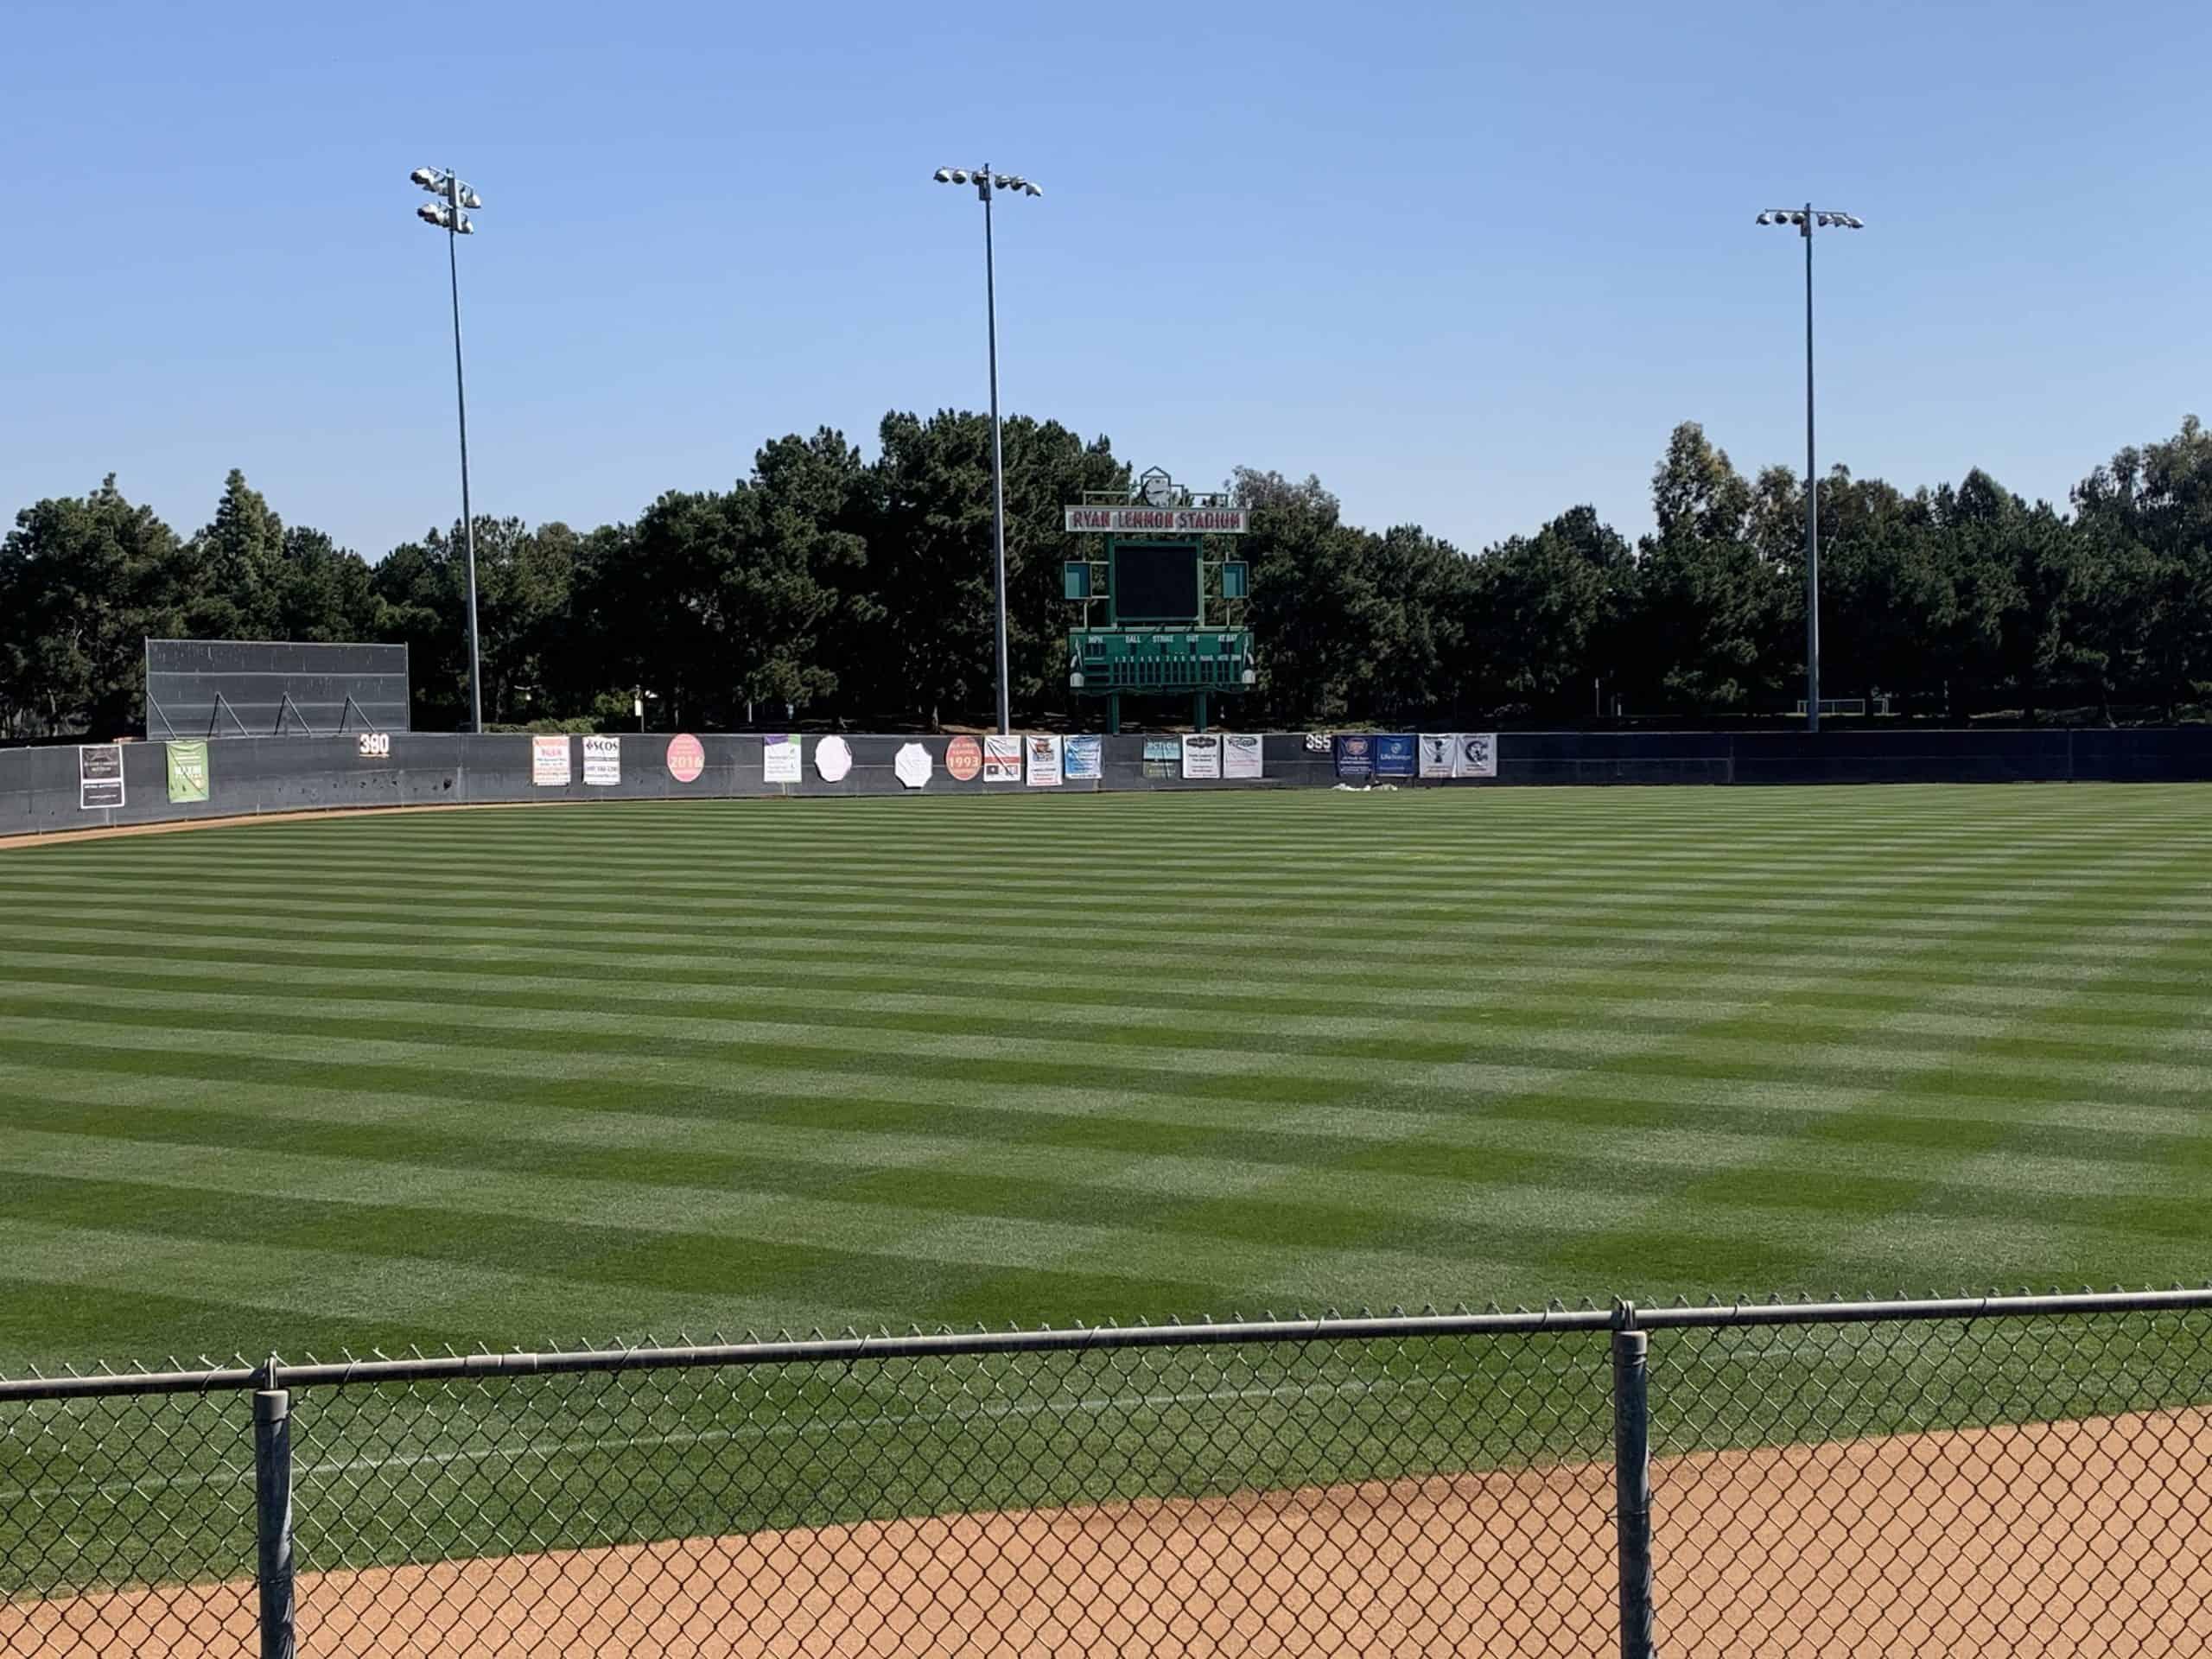 Organic Land Care baseball diamond park in Irvine, CA